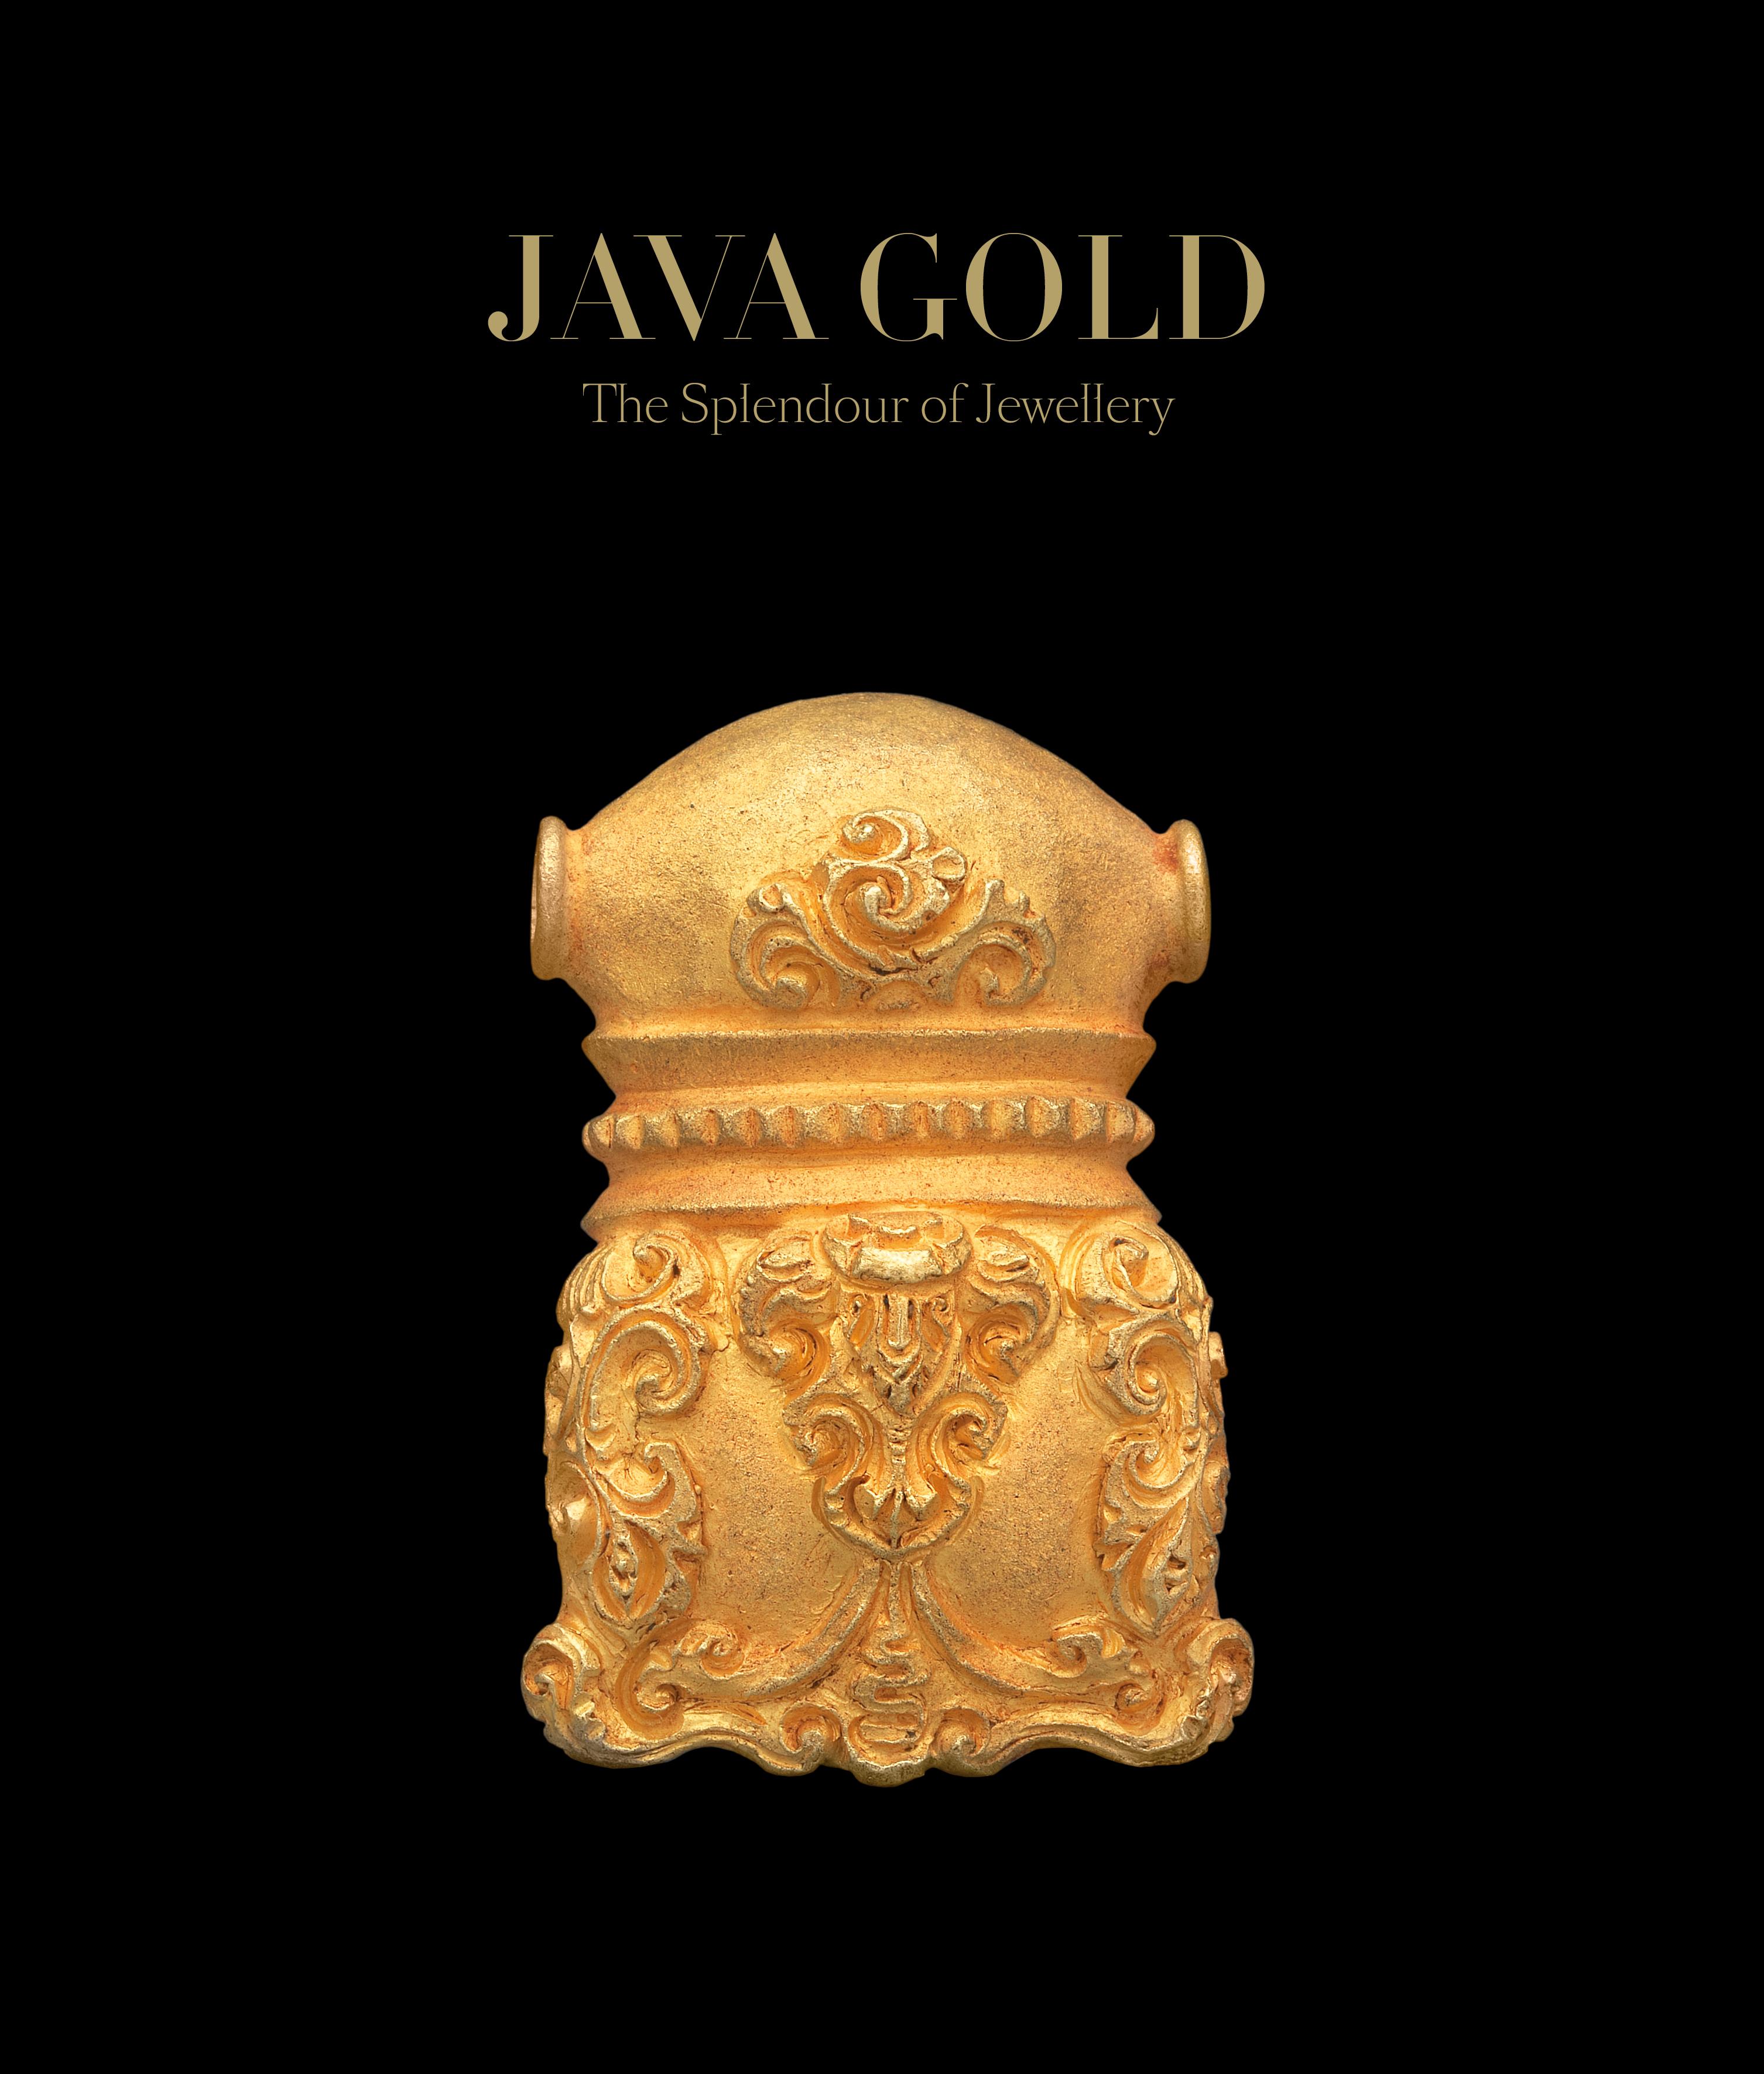 Java Gold:2  Splendour of Jewellery